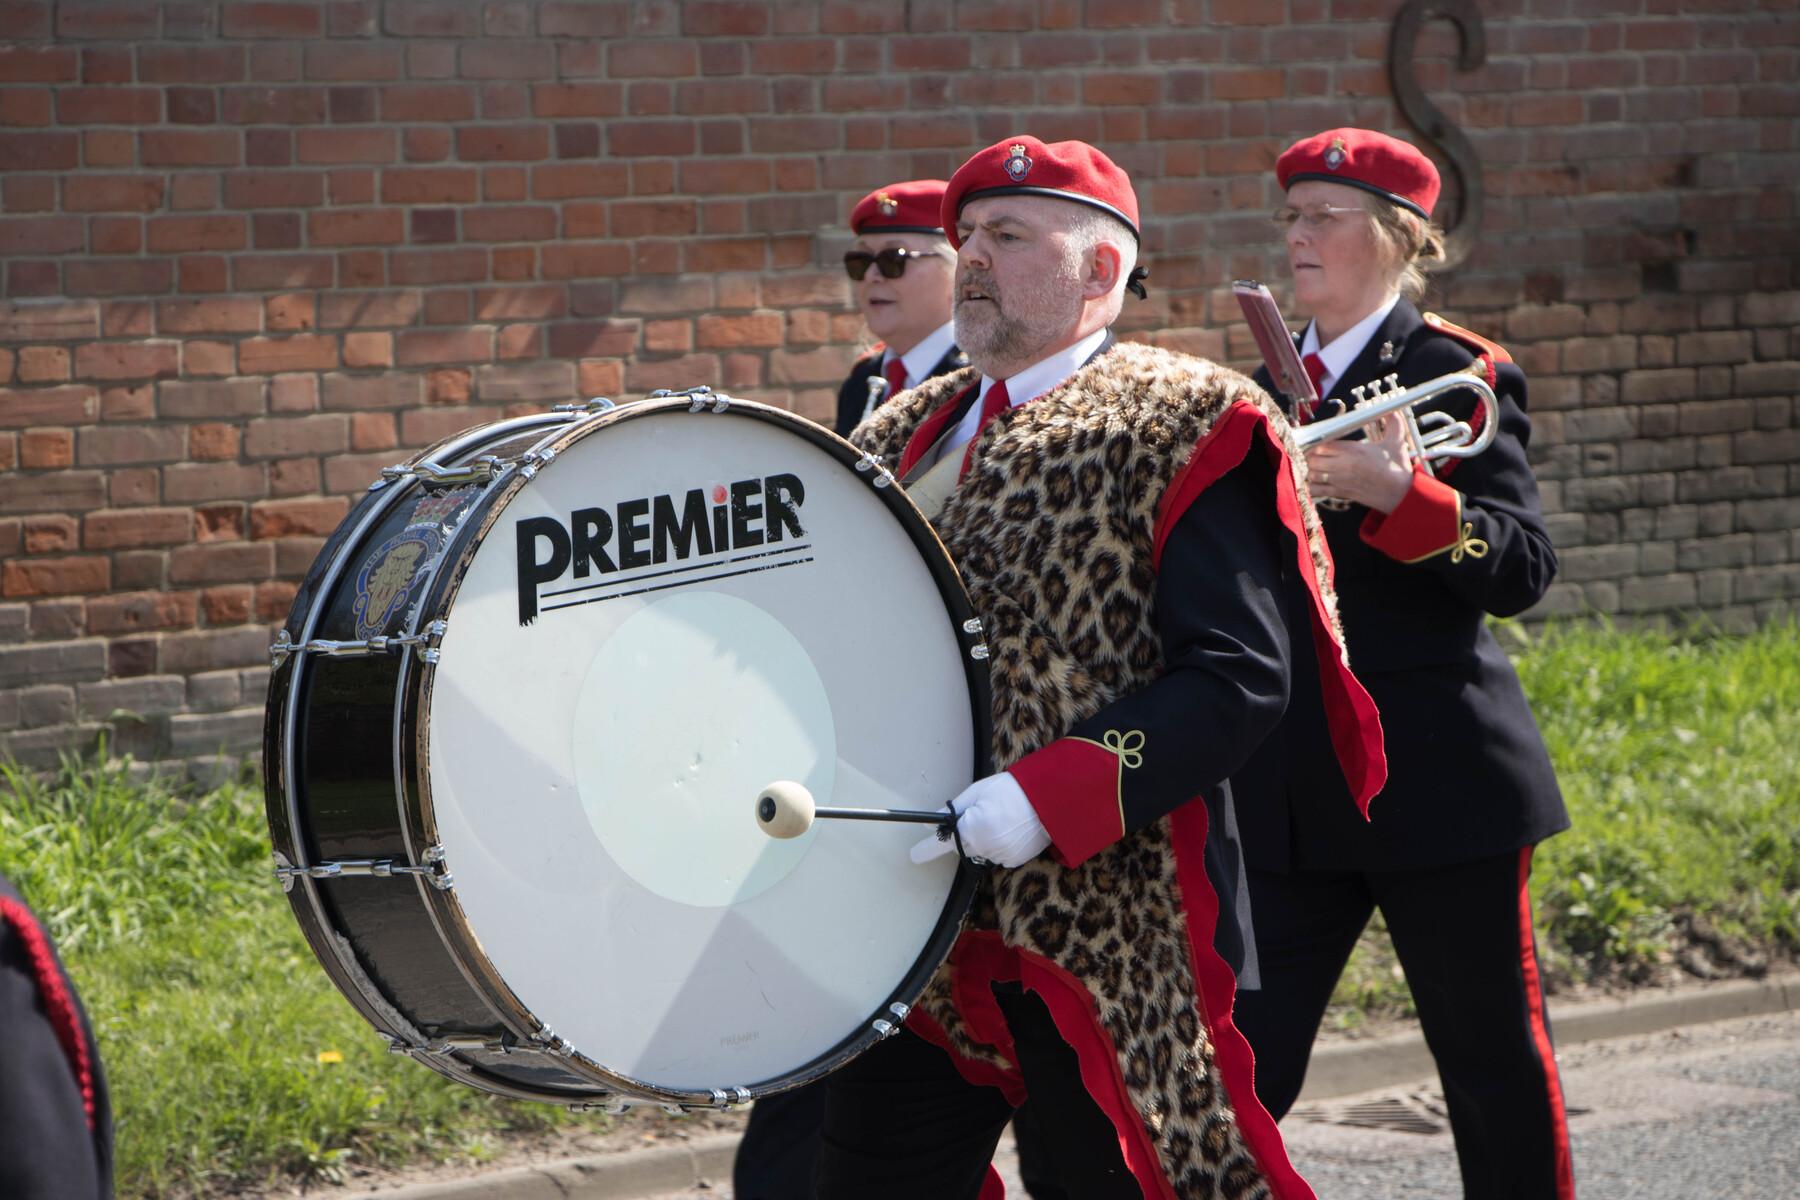 The Band of the Royal British Legion, Leiston